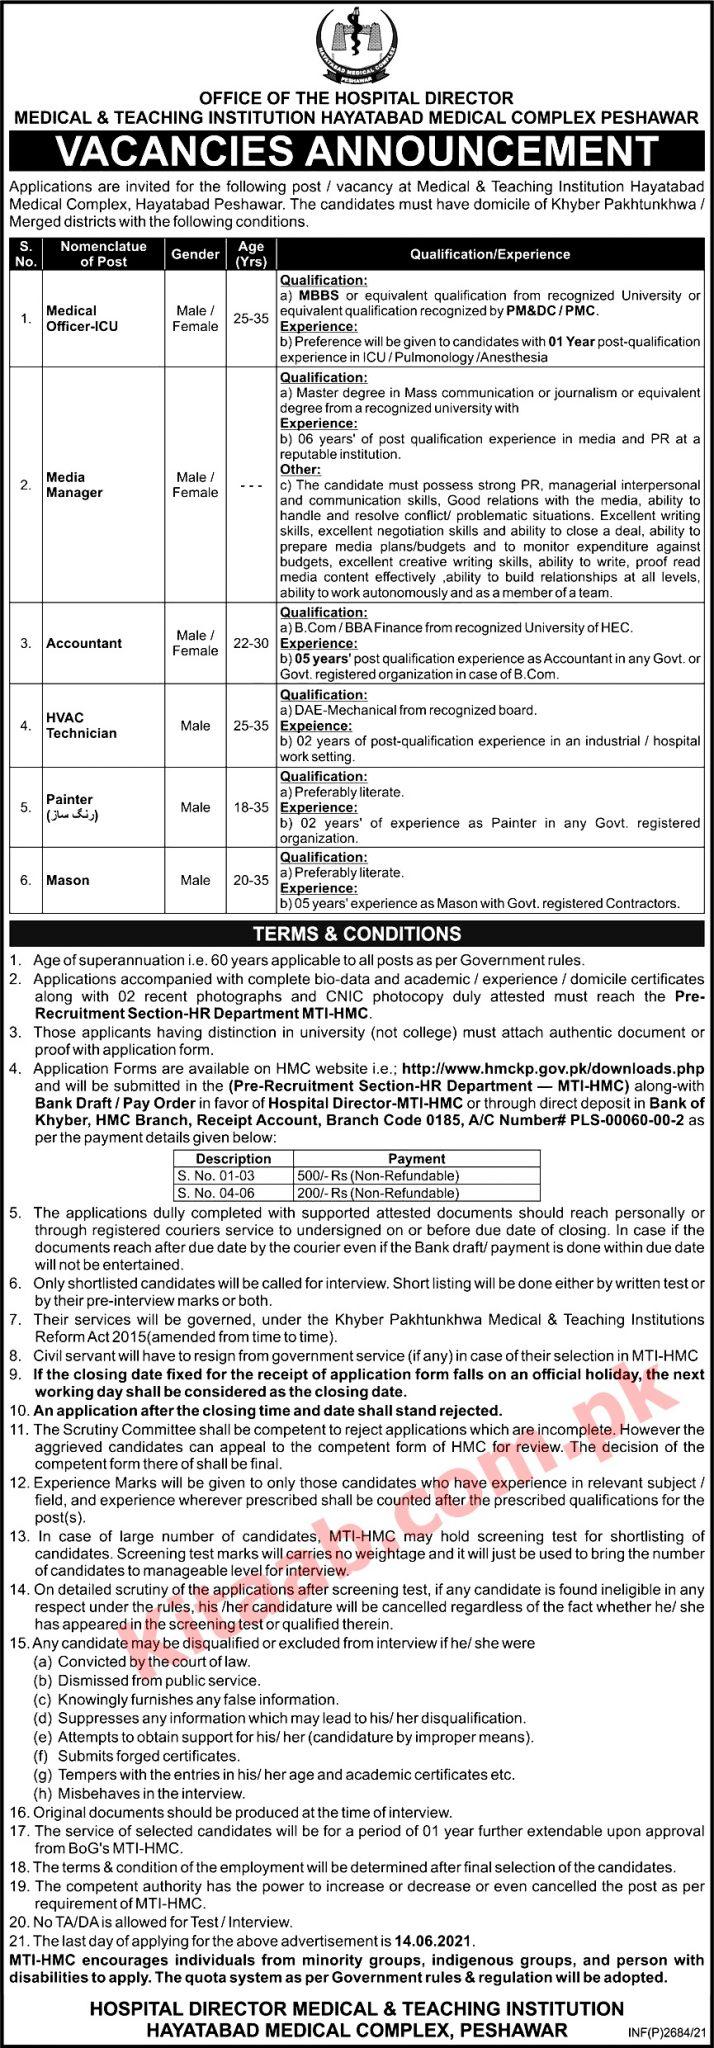 Hayatabad Medical Complex Peshawar Jobs 2021 MTI Application Form Dates and Schedule Interviews Test